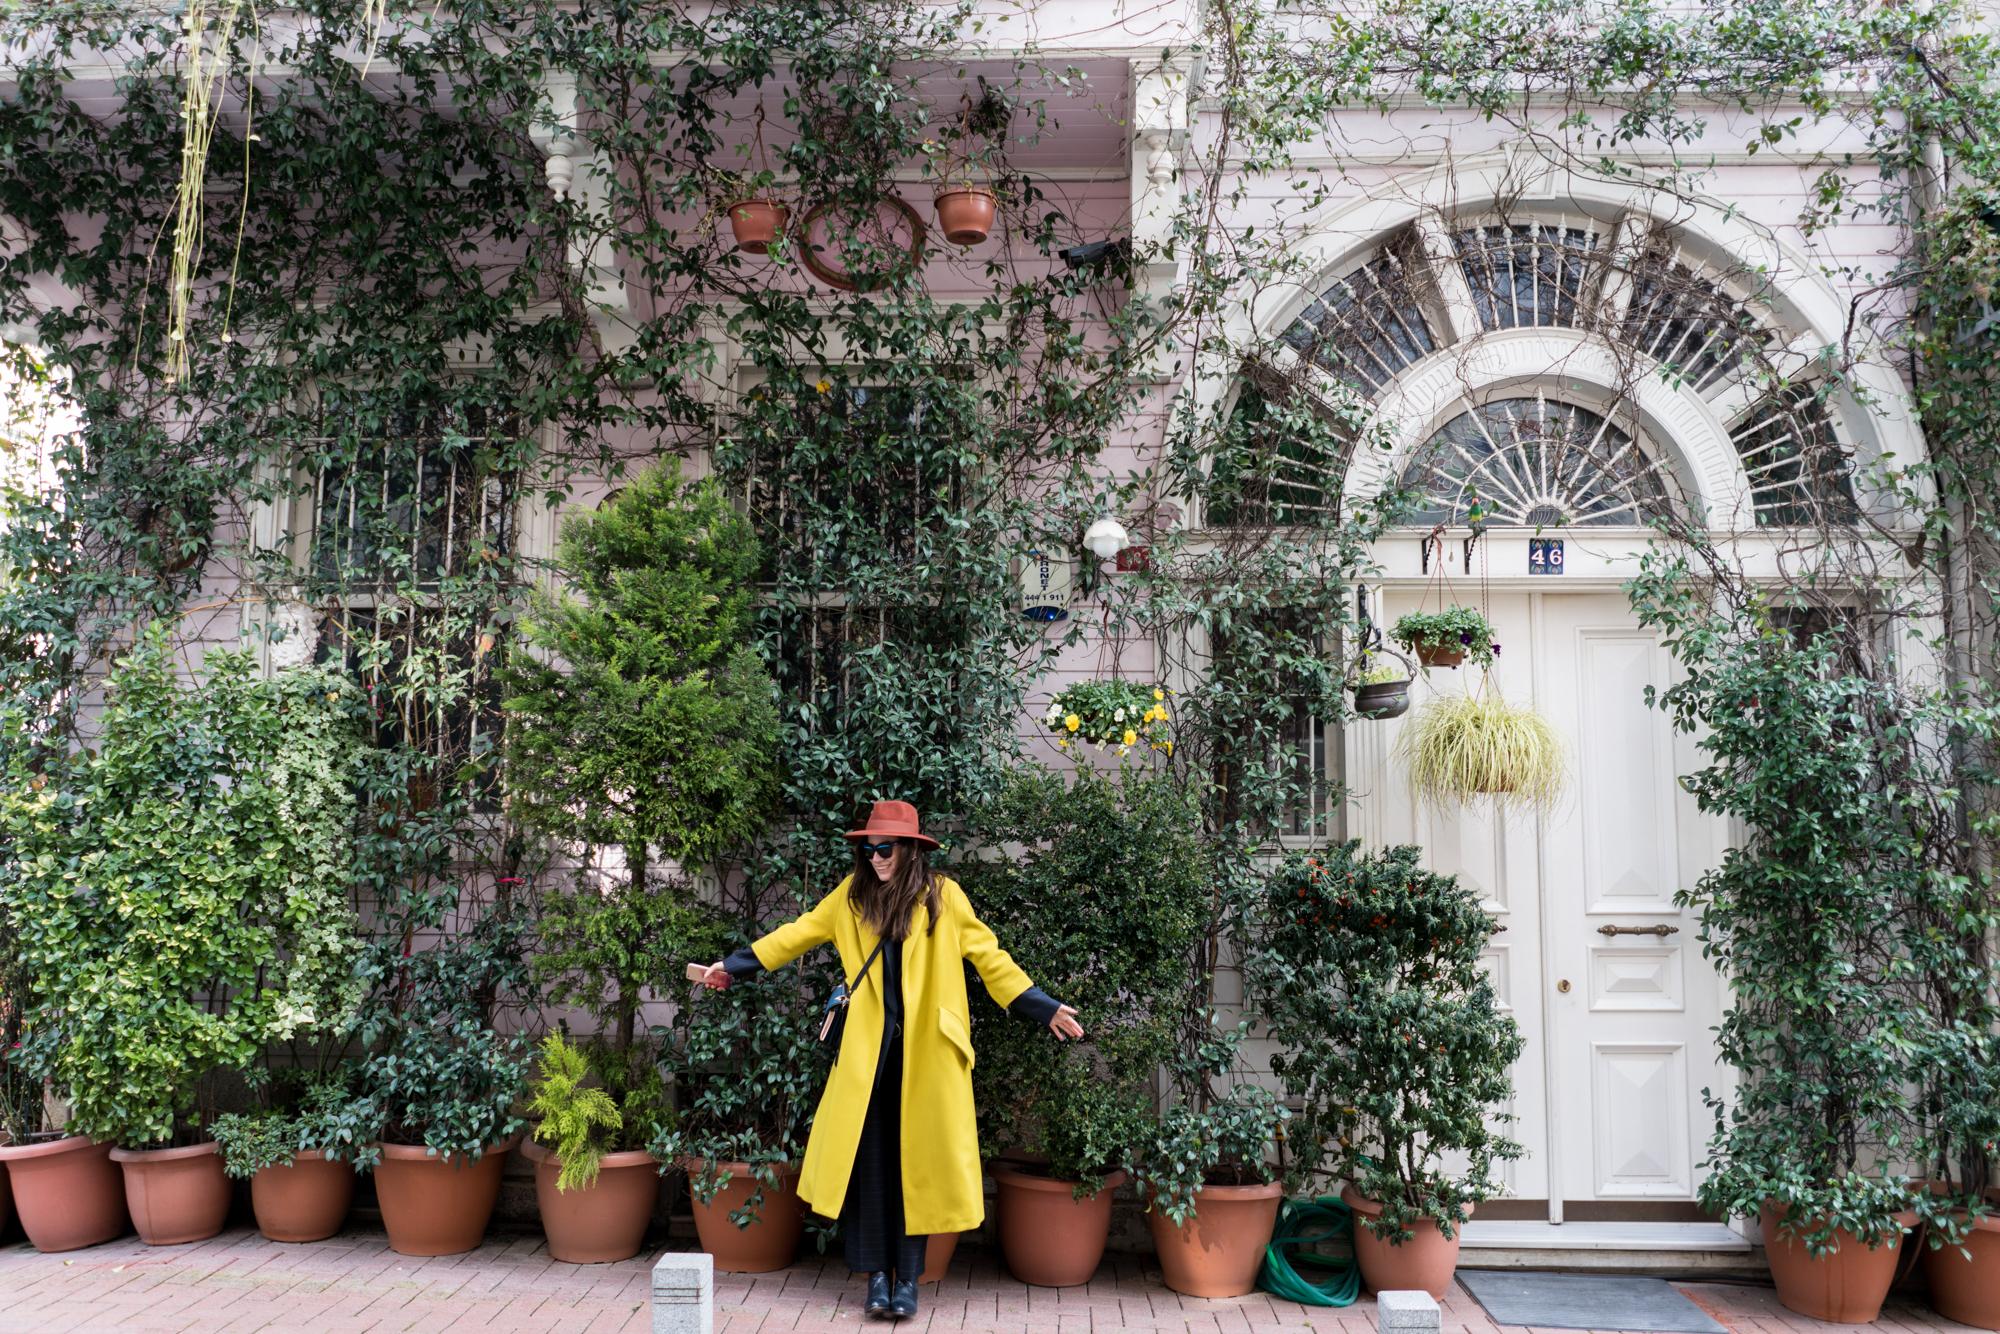 billur saatci, offnegiysem, street style, turkish style blogger, destree, mybestfriends, zara, kenzo, opening ceremony, dior, academia